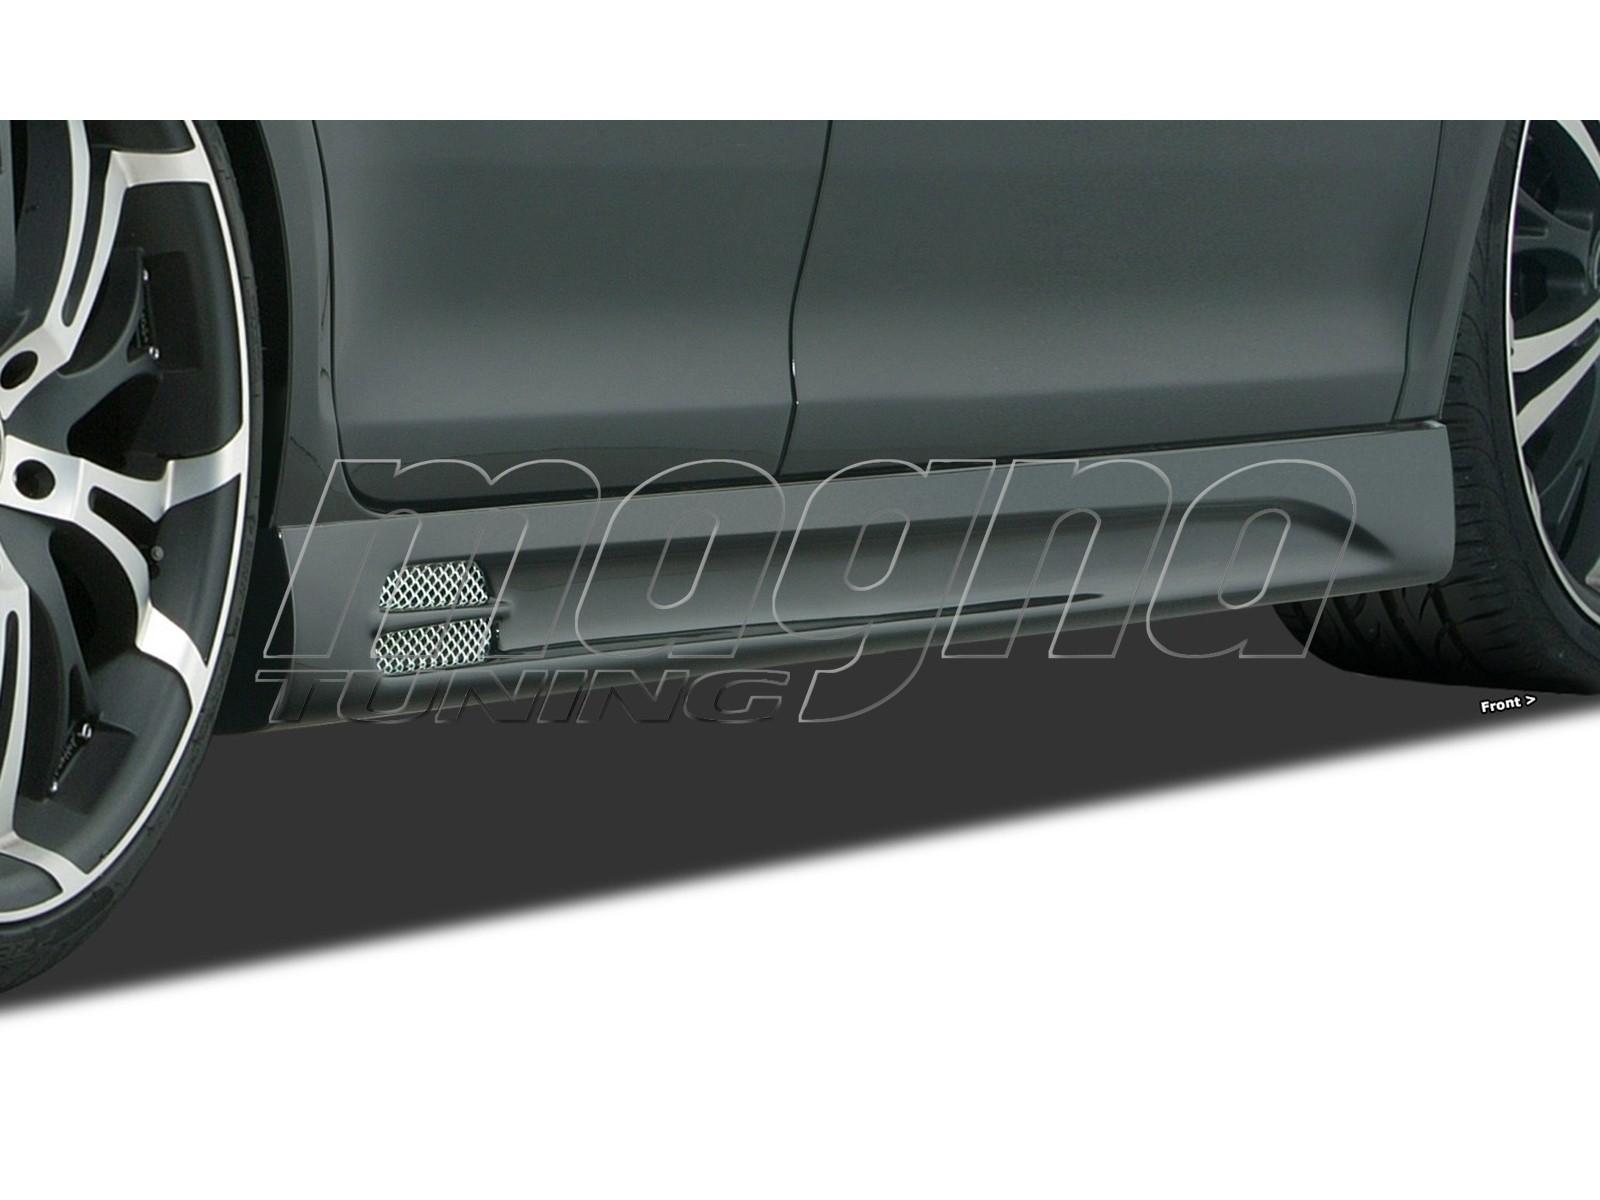 Volvo V60 MK2 GTX-Race Side Skirts